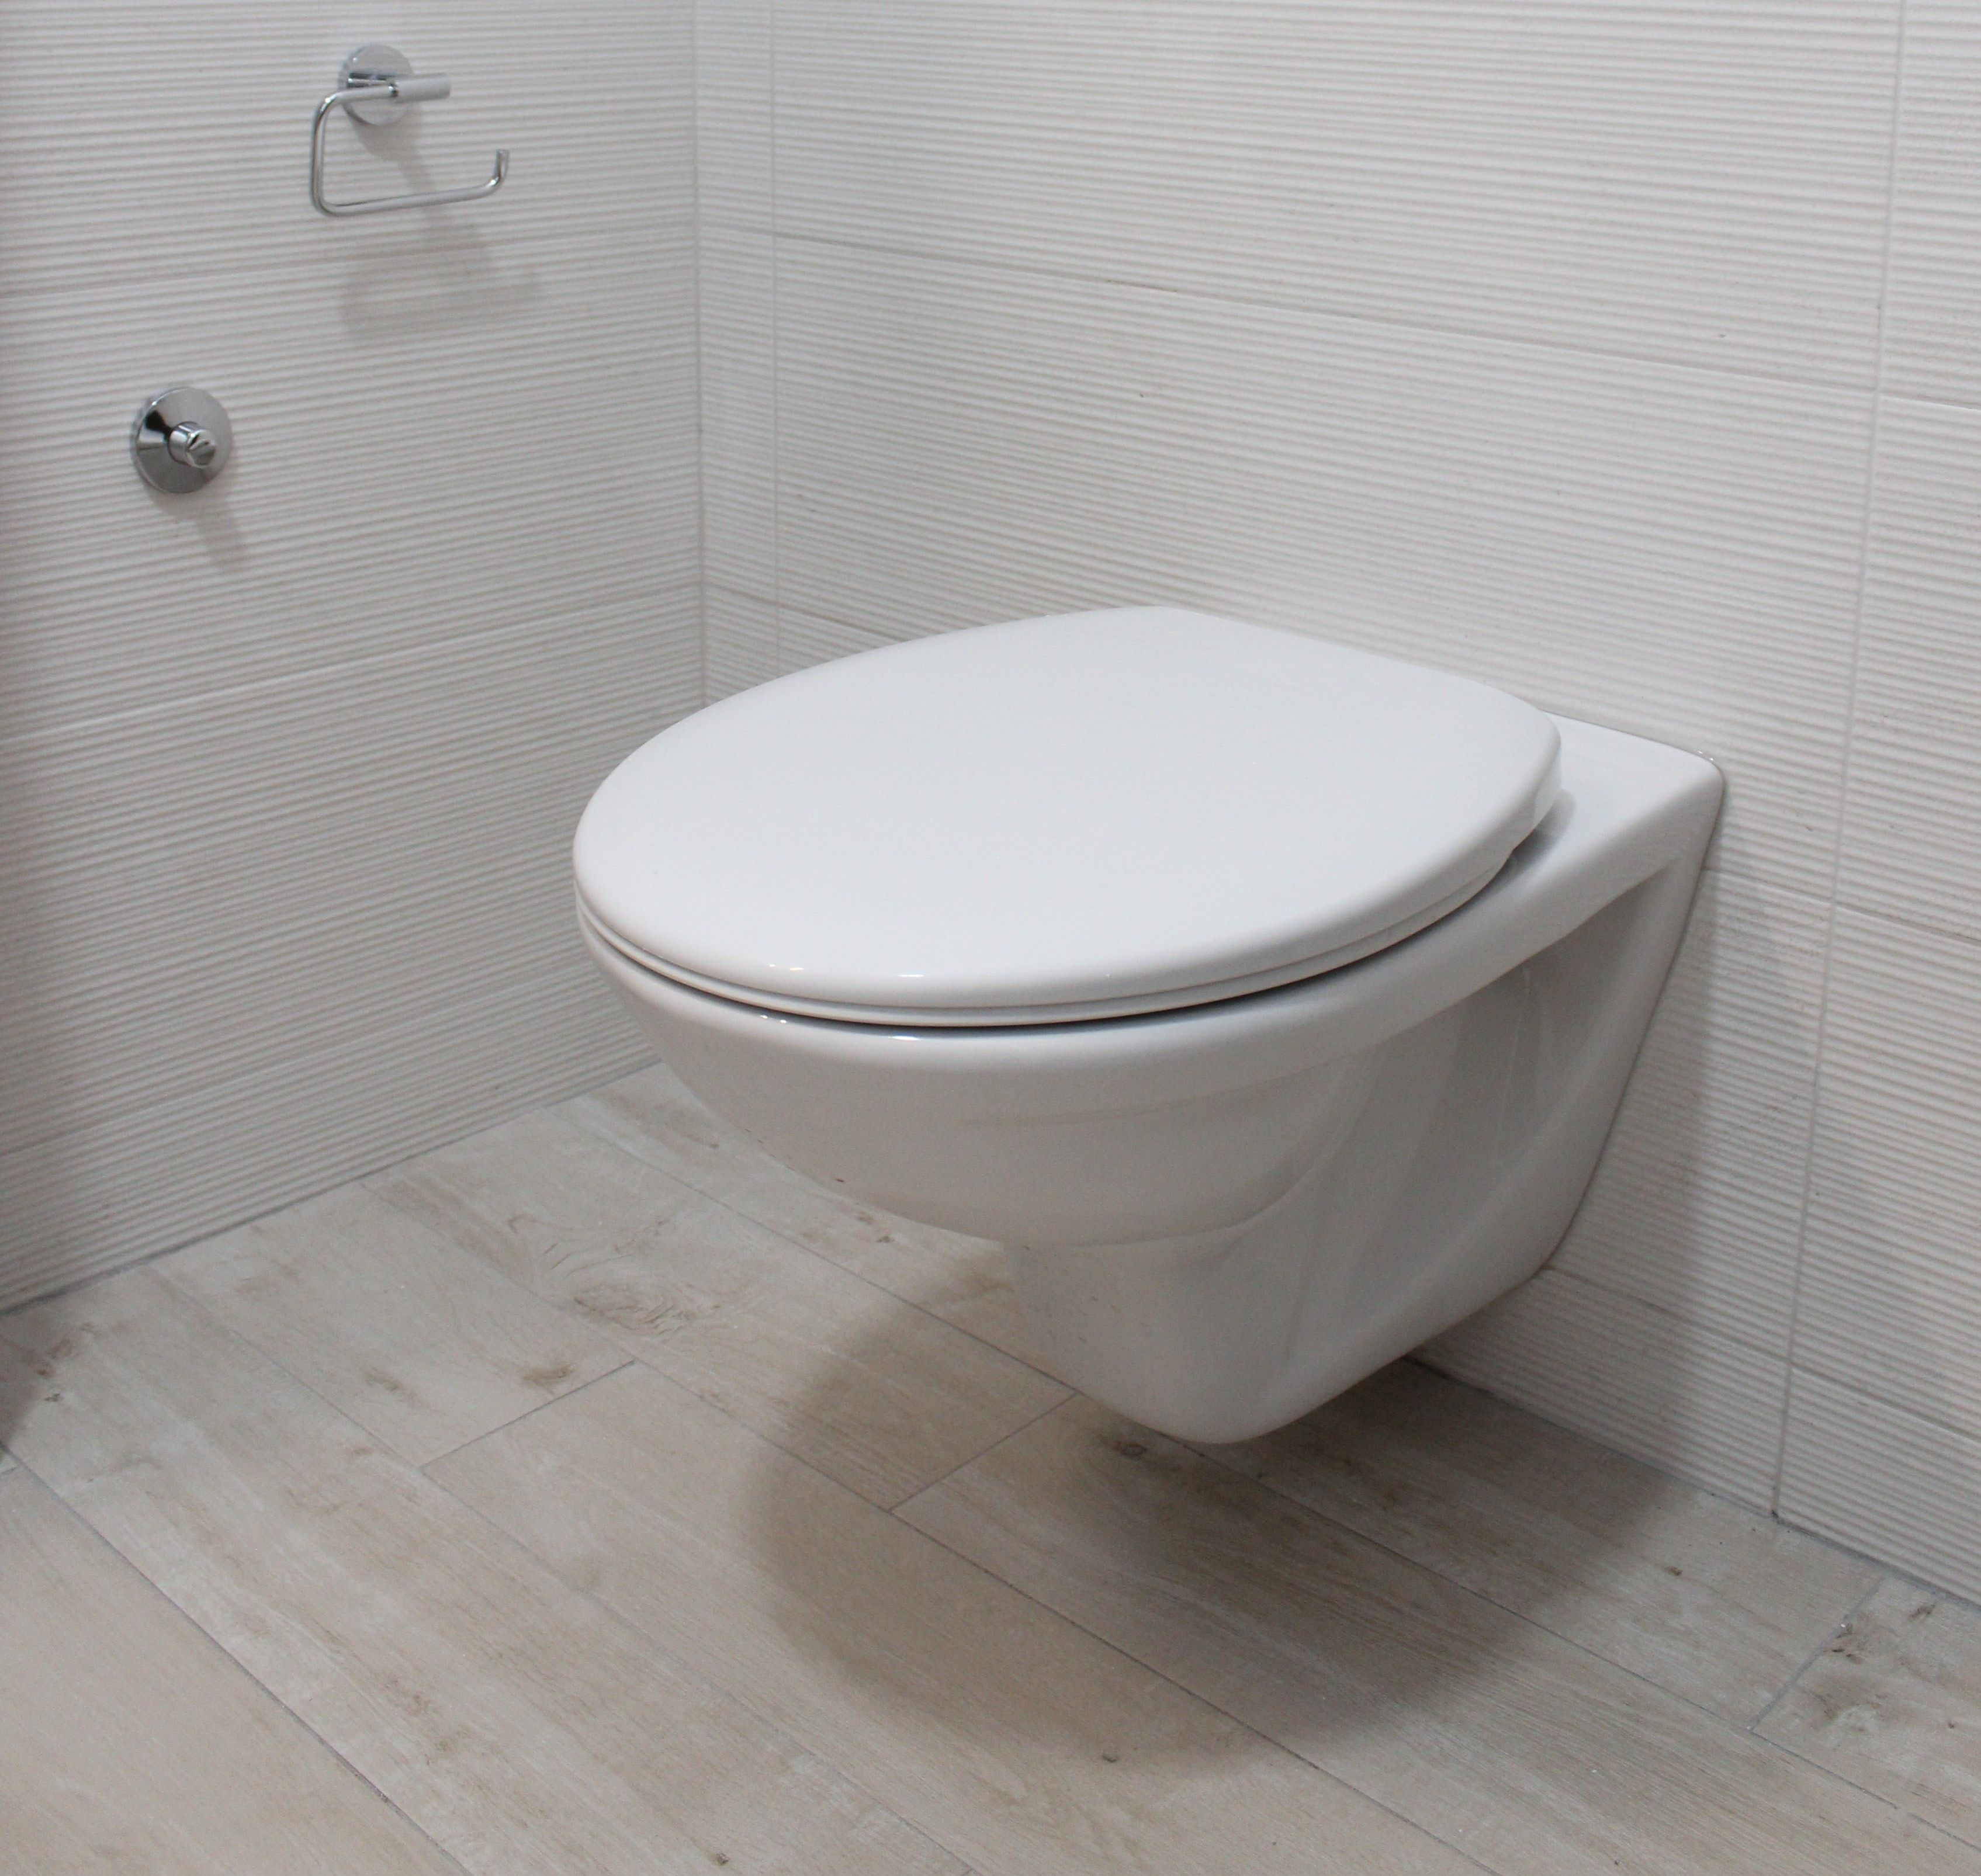 Pin On Wall Hung Toilets